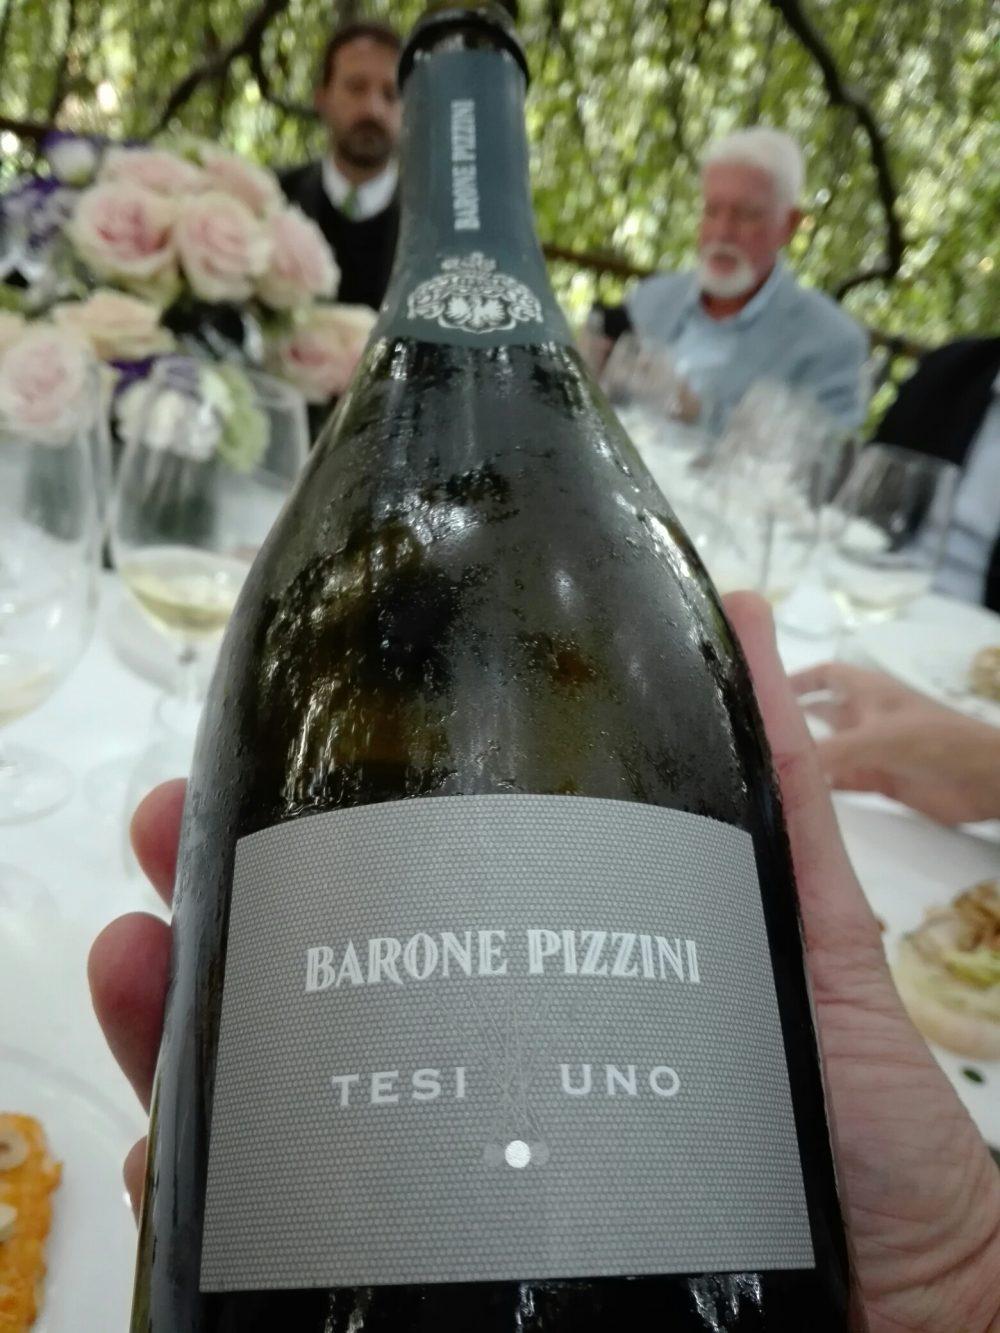 Barone Pizzini, Tesi Uno 2012